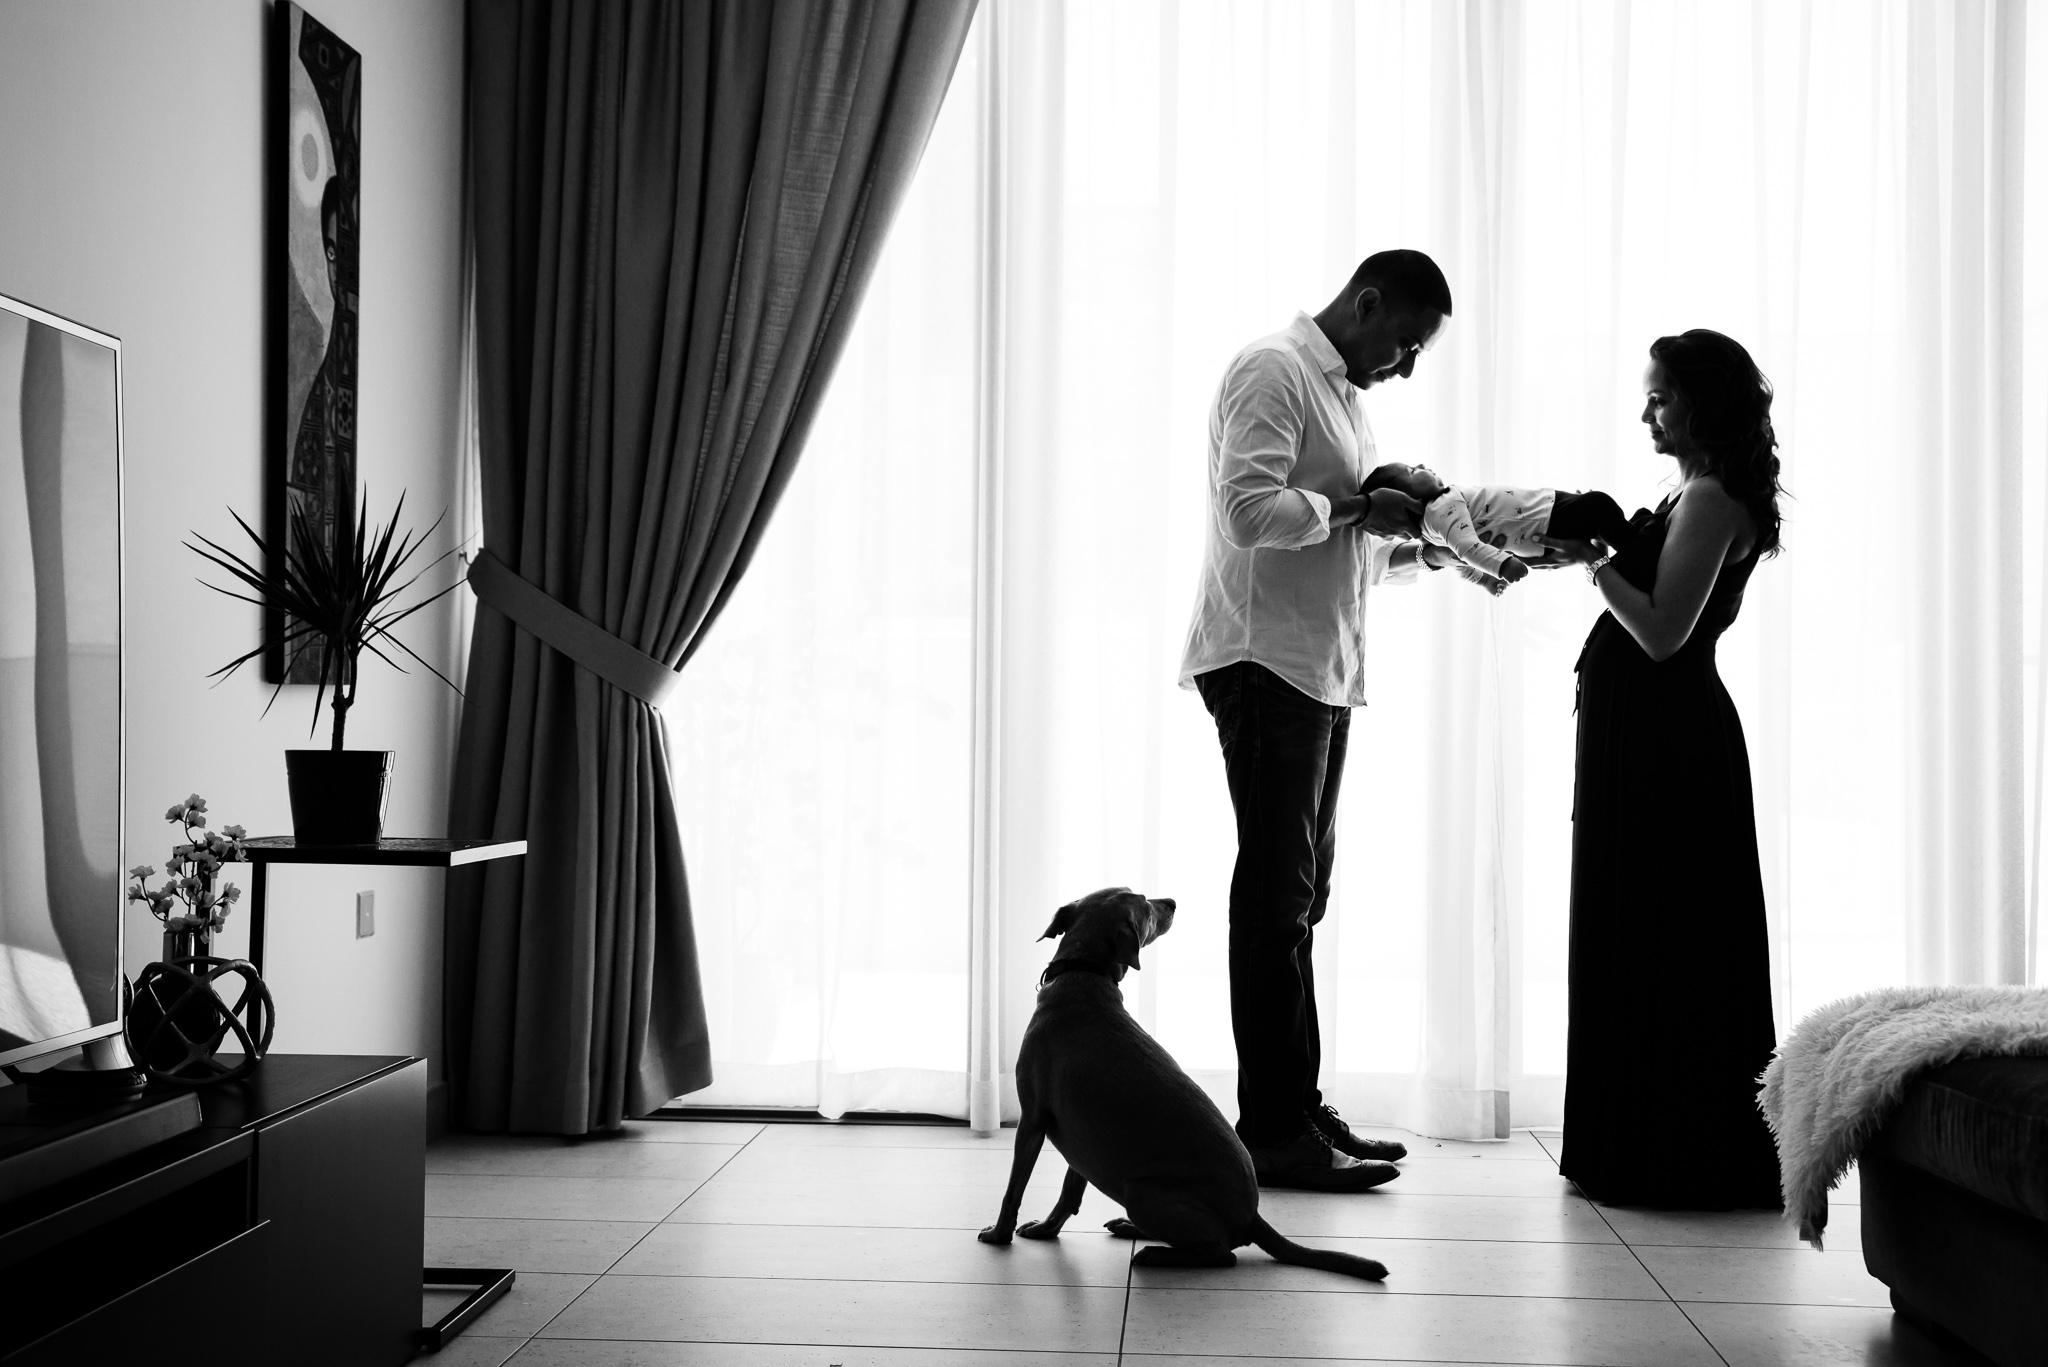 Lana-Photographs-Abu-Dhabi-Newborn-Photographer-Egla-PSLR-44.jpg